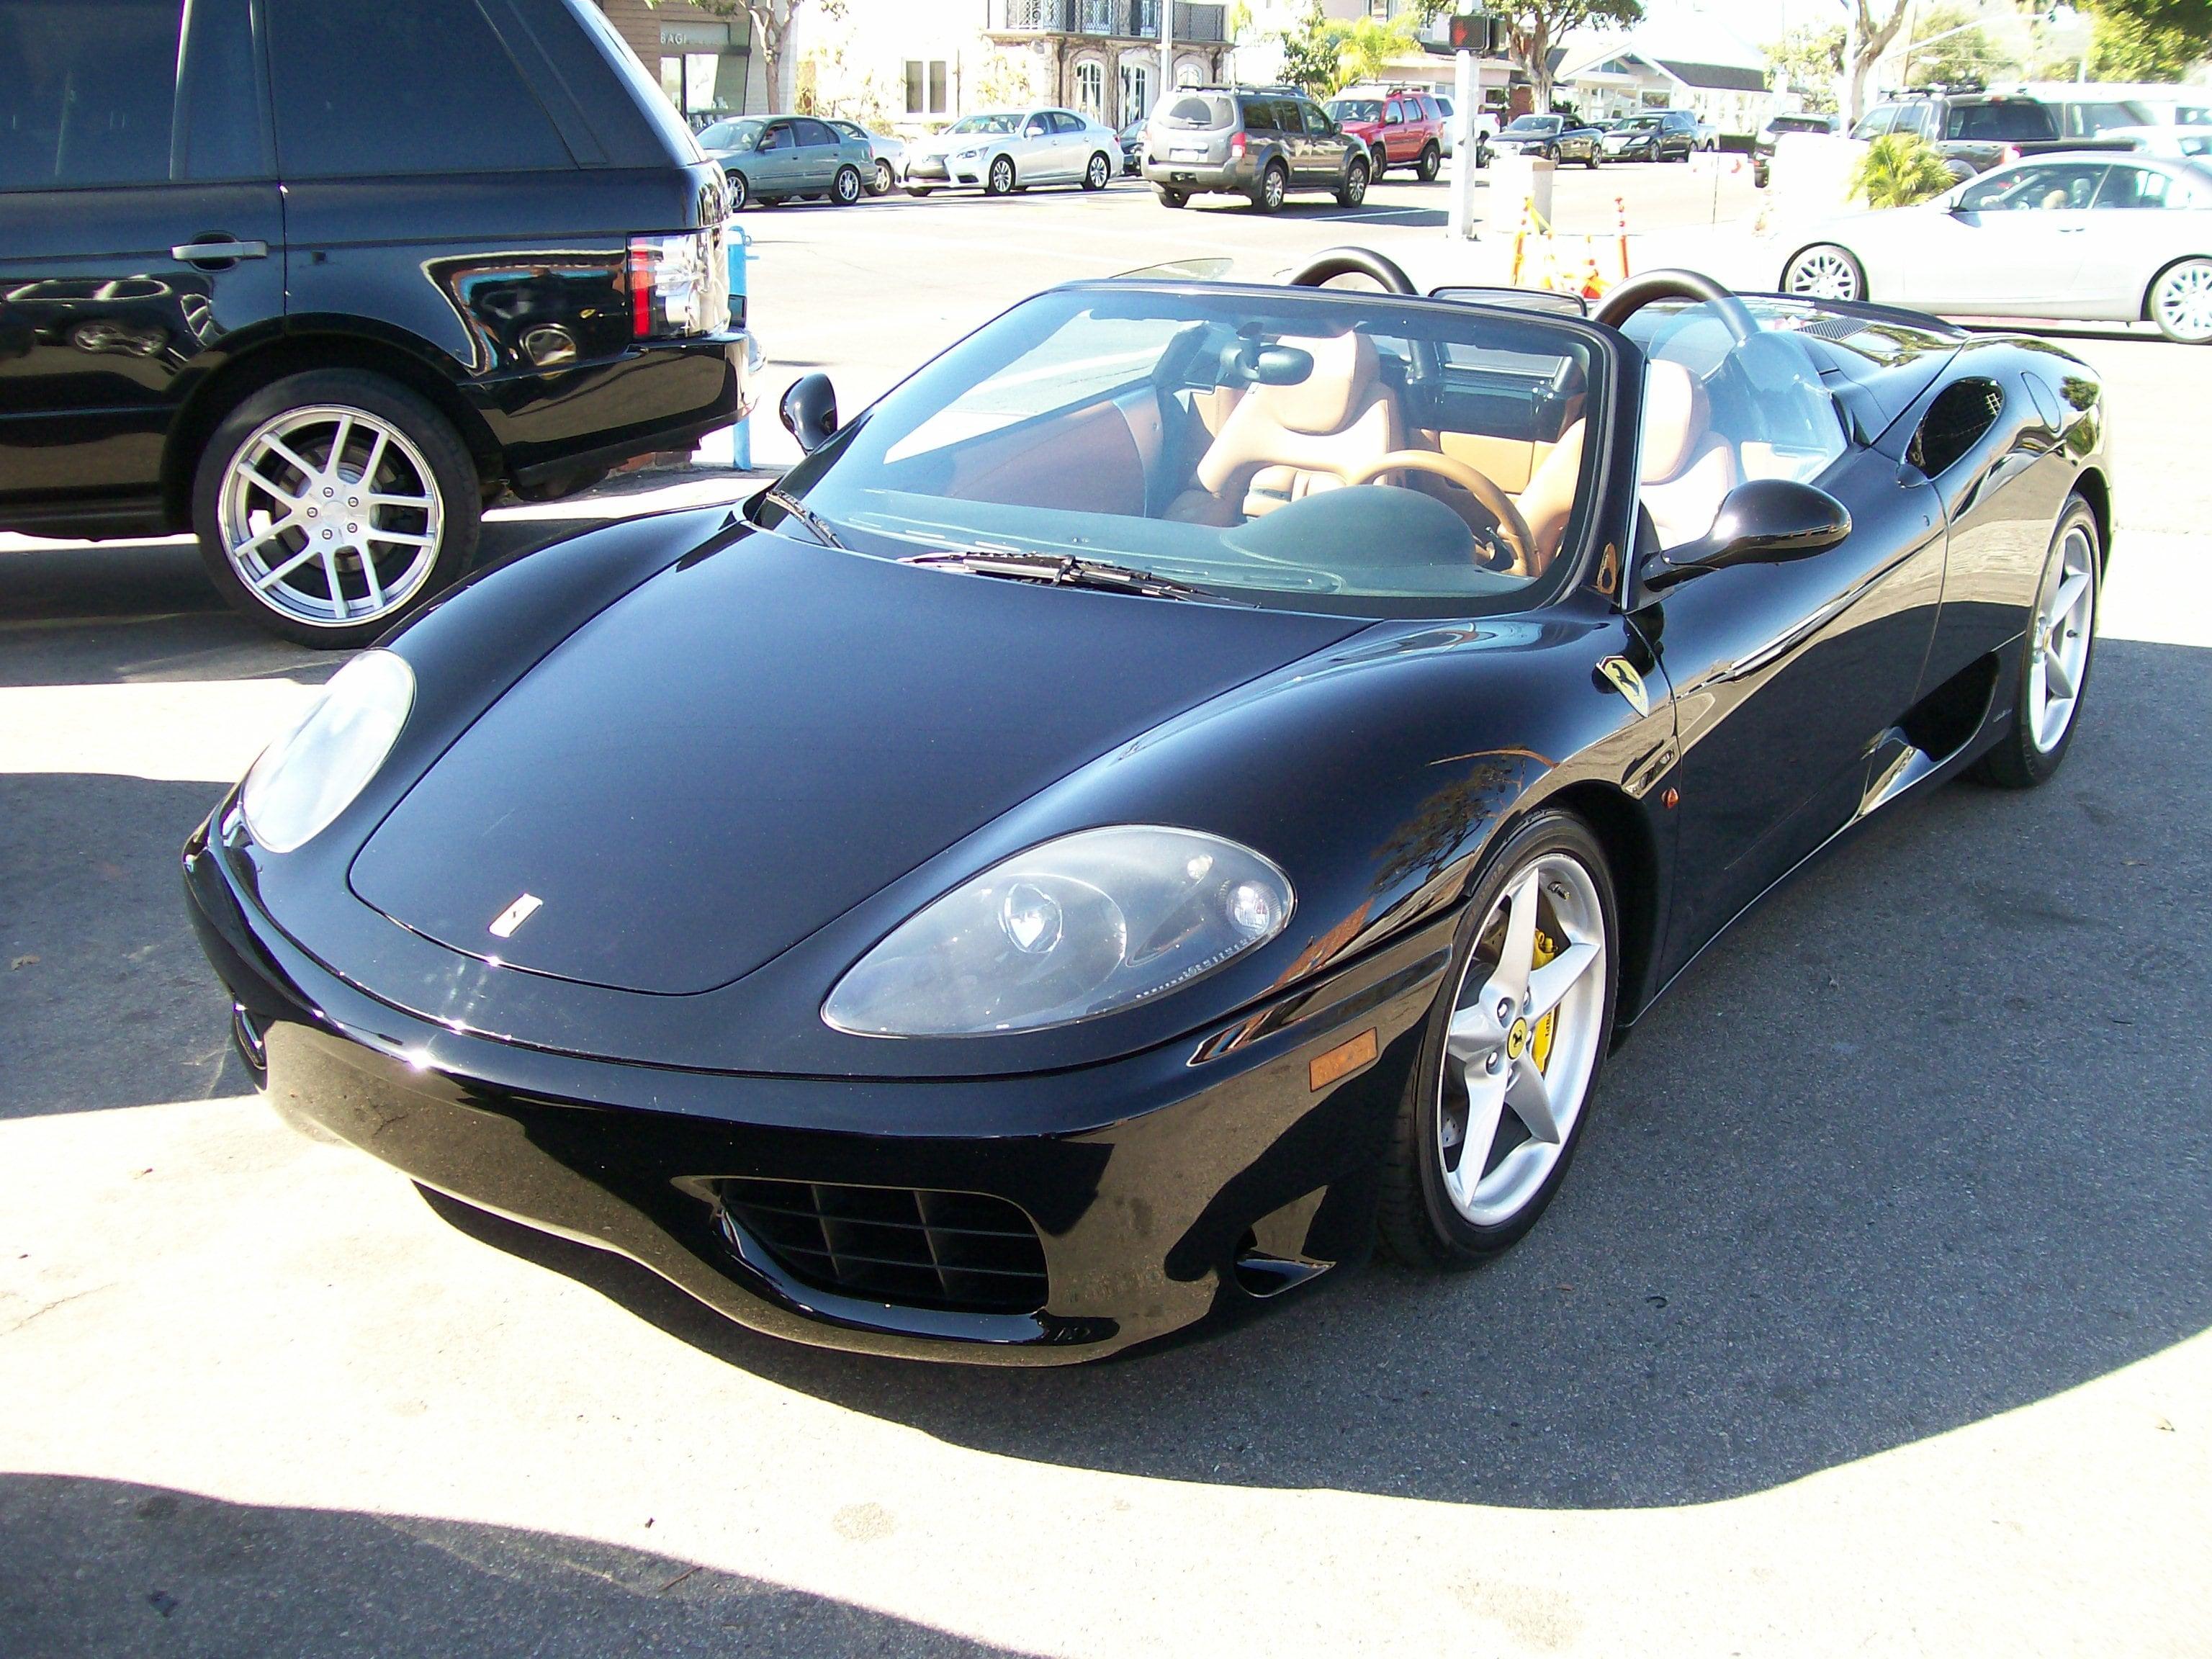 Used 2002 Ferrari 360 Modena For Sale At Rubens Imports Vin Zffyt53ax20129735